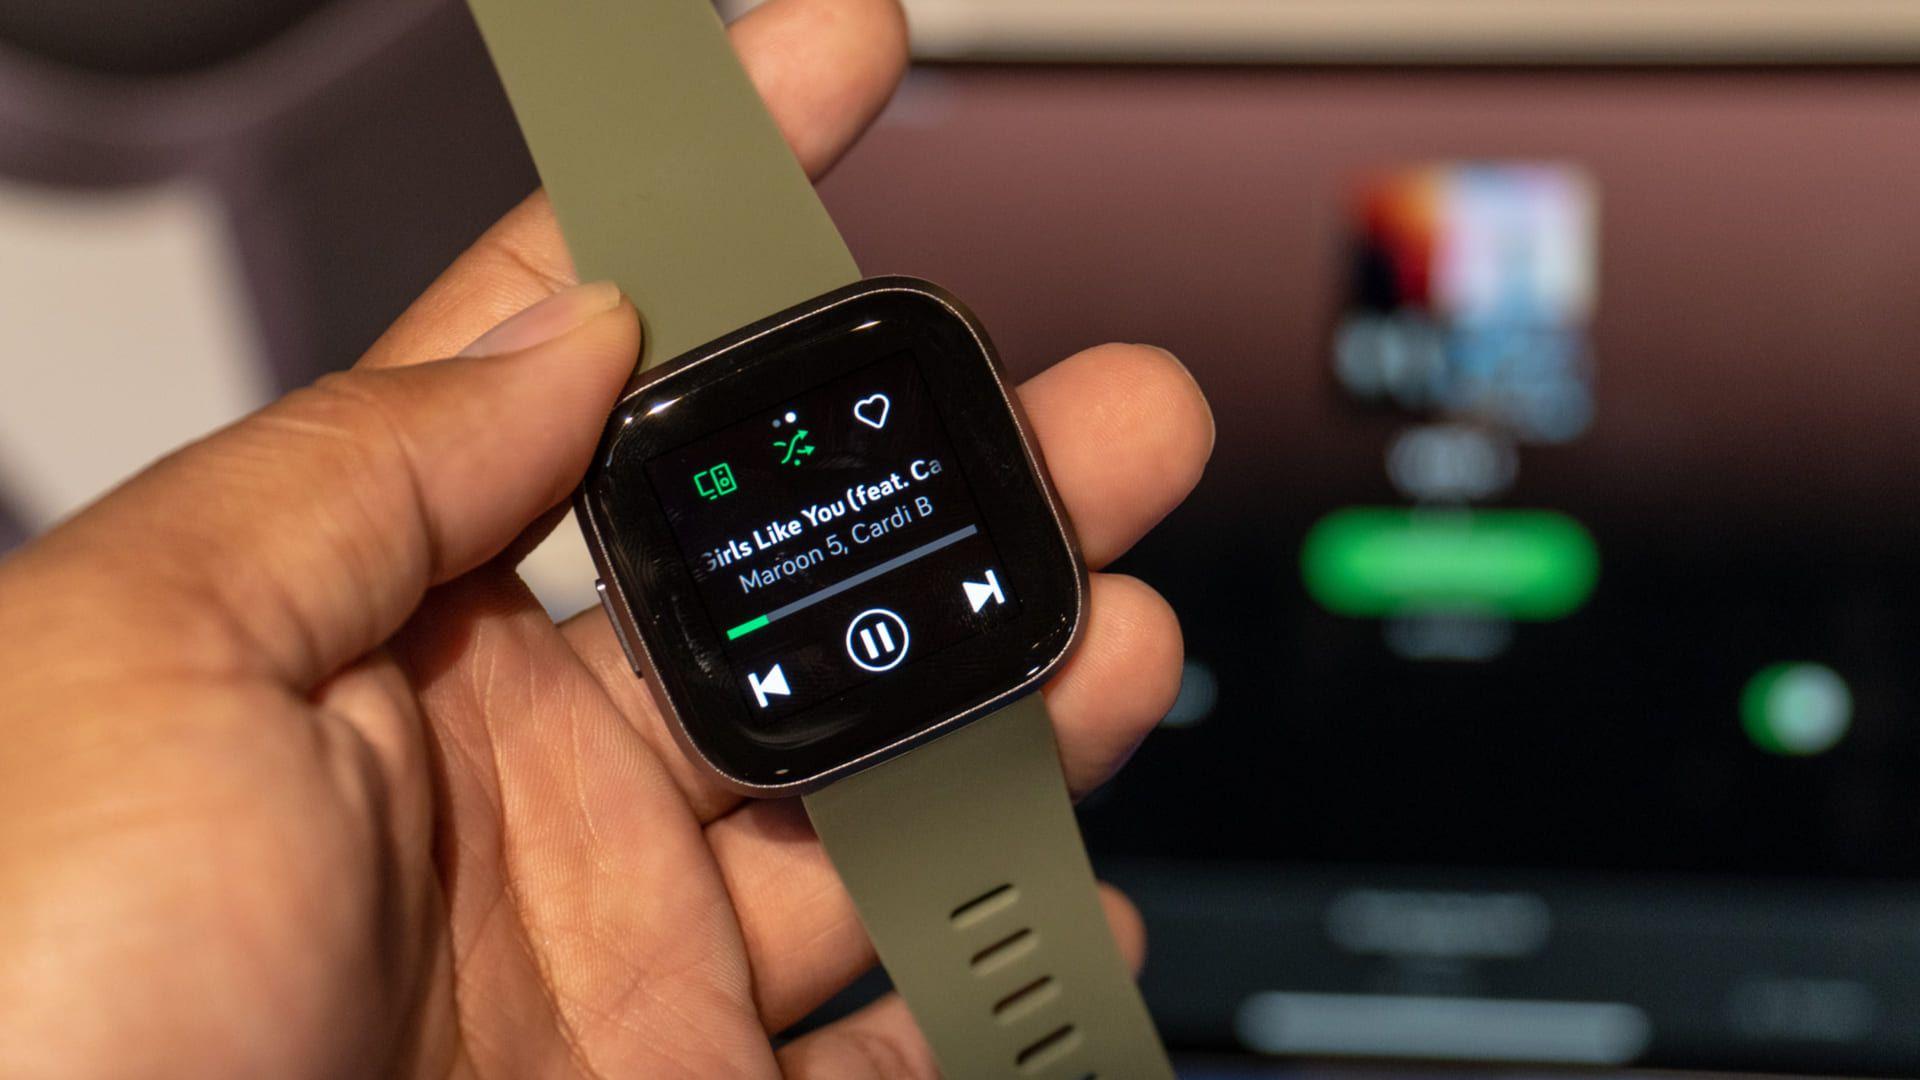 Baixar Spotify no smartwatch é bem simples (Foto: Lukmanazis / Shutterstock